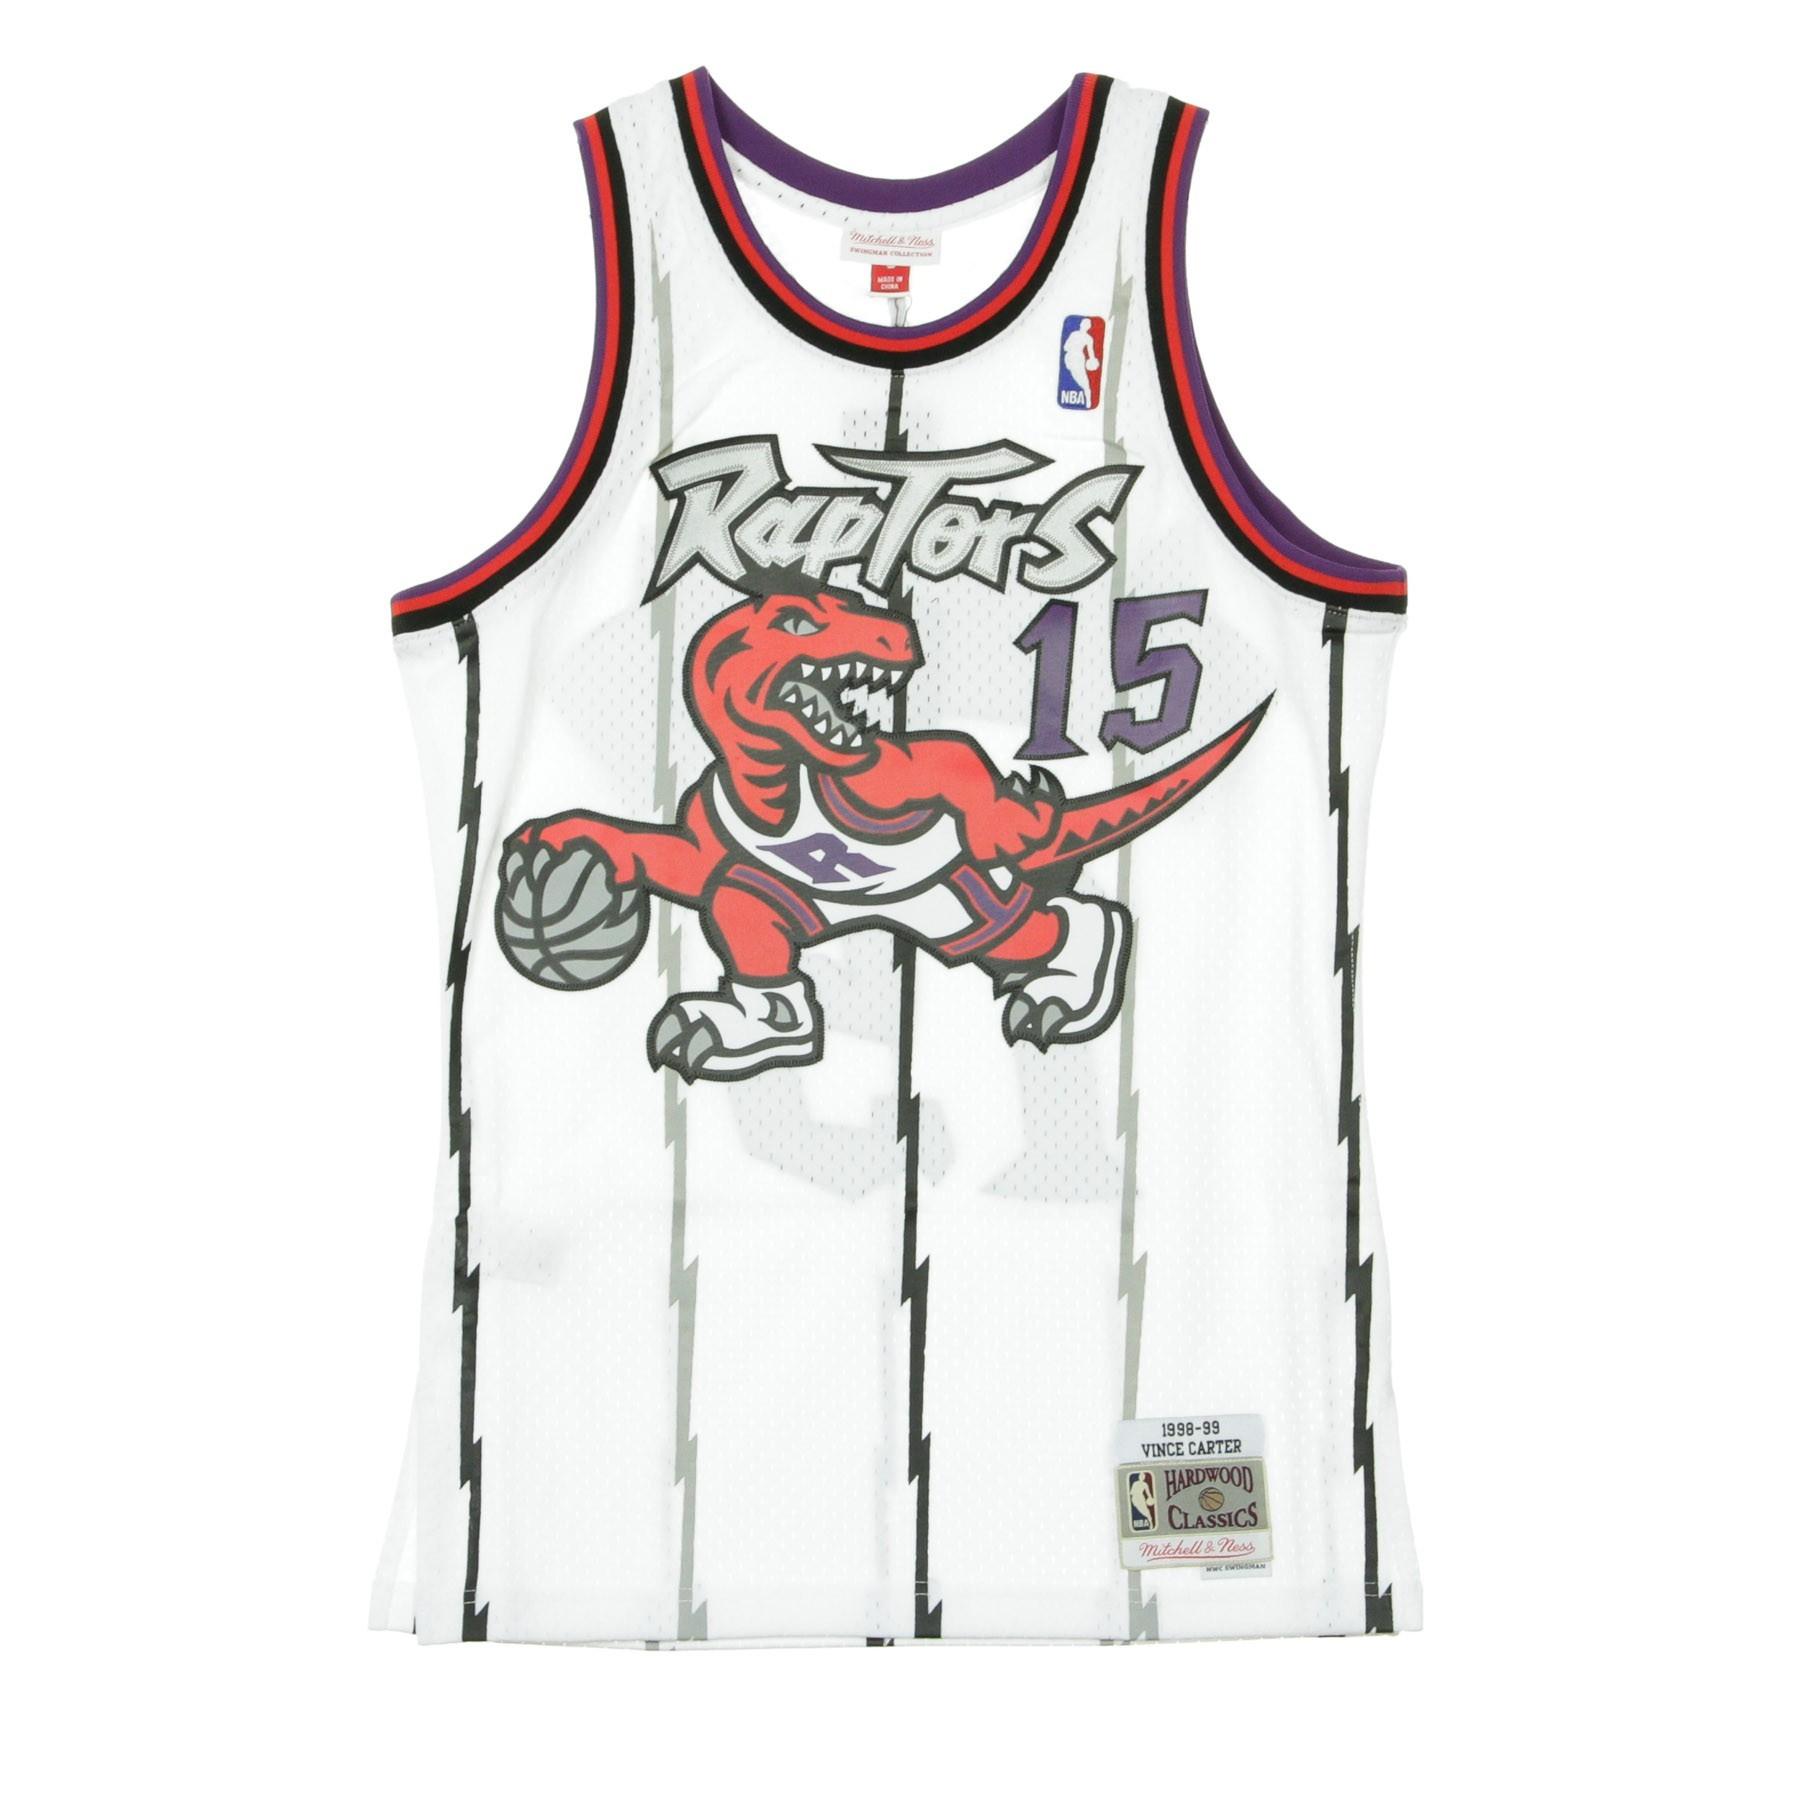 super popular 6bfd5 ddd3b CANOTTA NBA SWINGMAN JERSEY VINCE CARTER NO15 1998/99 HOME TORRAP ORIGINAL  TEAM COLORS | Atipicishop.com